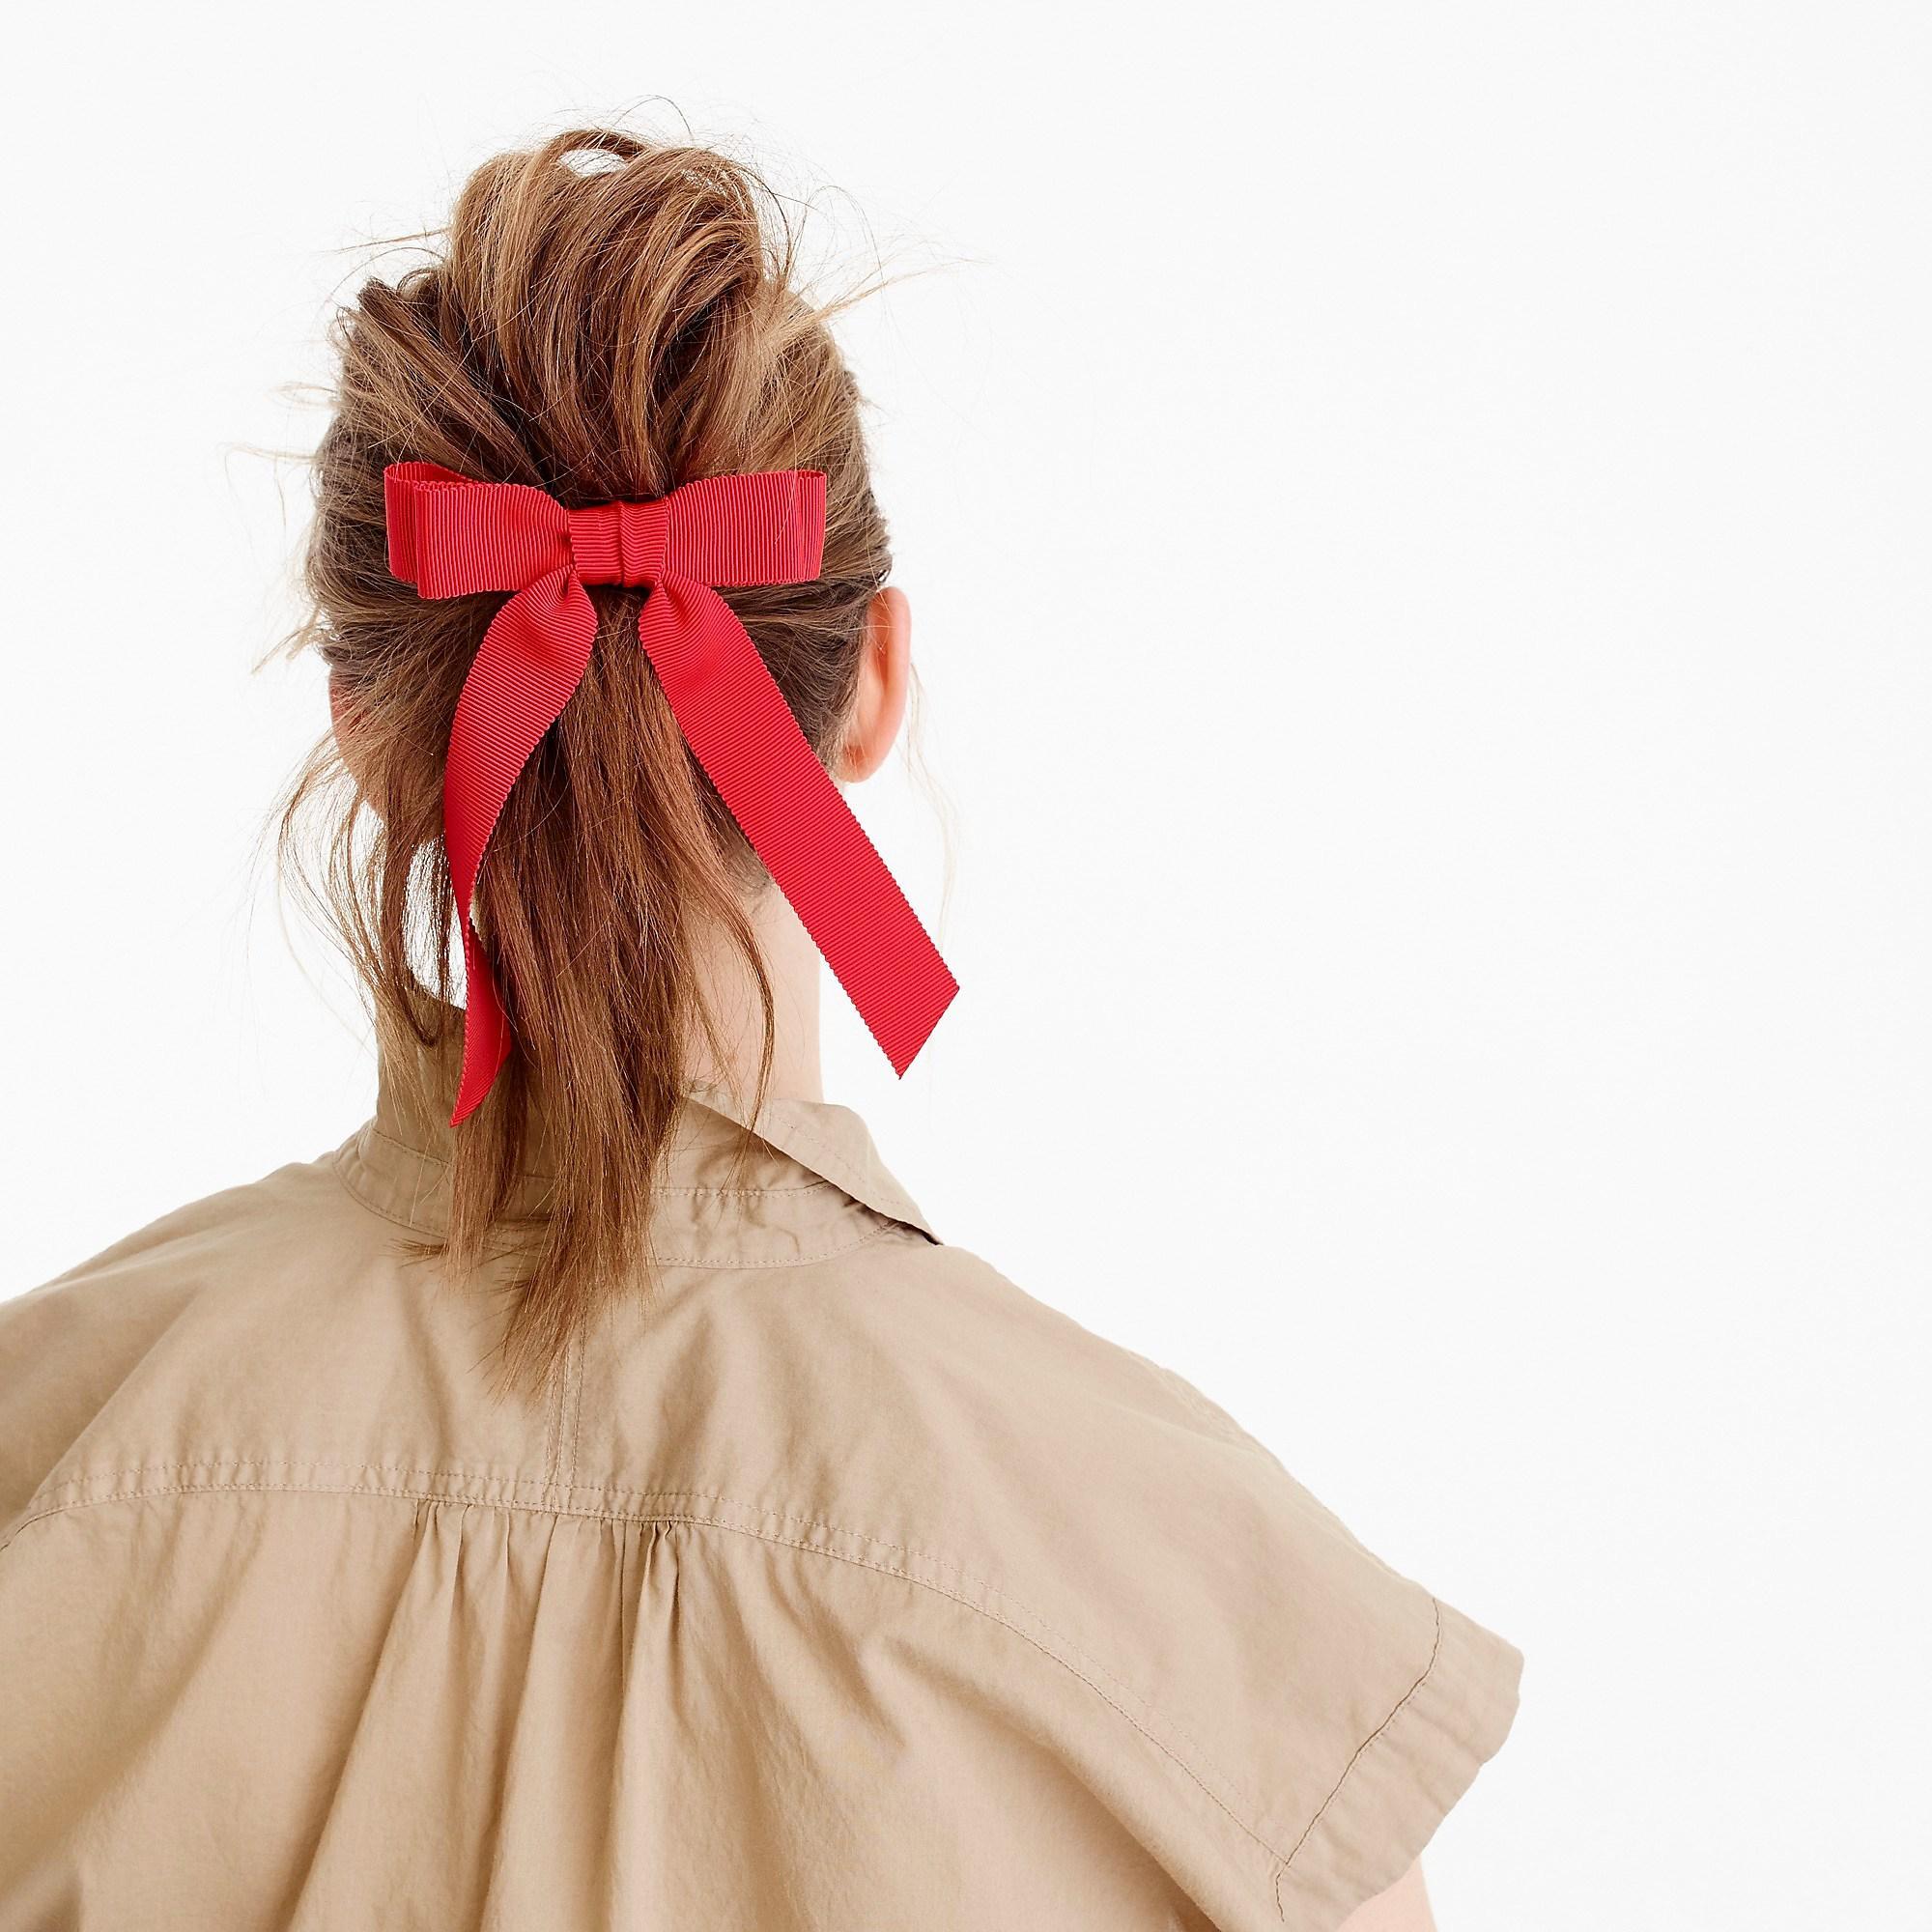 Lyst - J.Crew Grosgrain Ribbon Hair Tie in Red e1e7b820bde